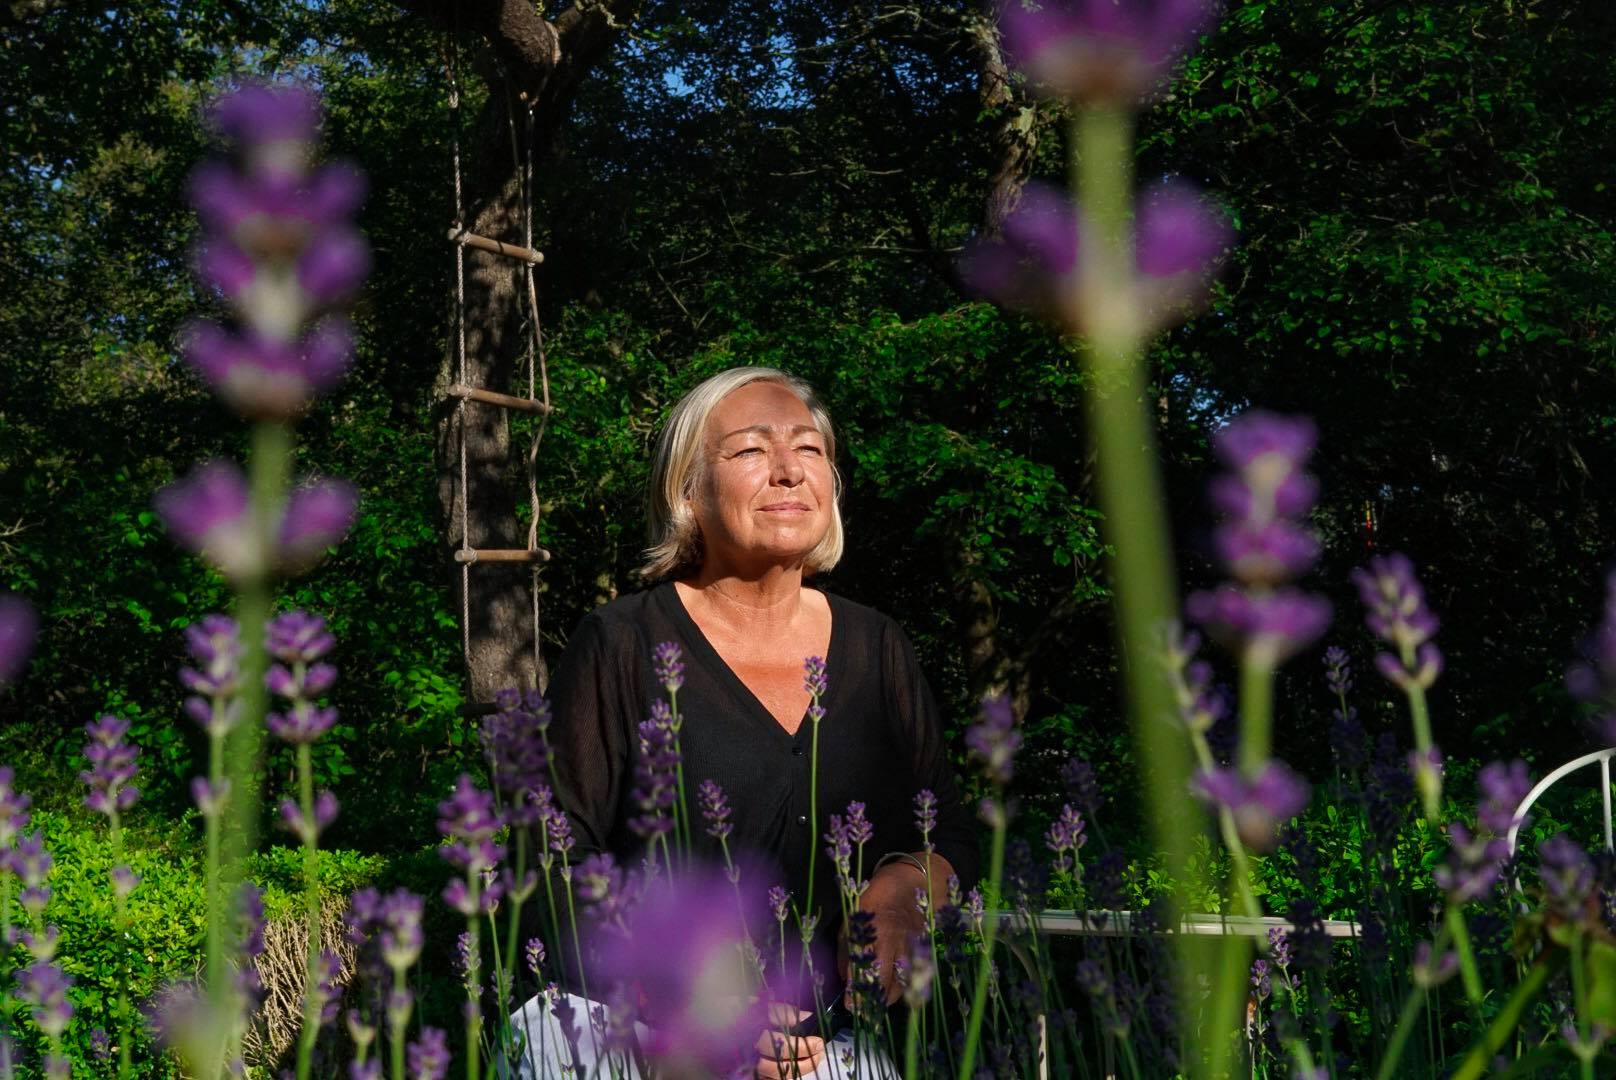 Viveka Eriksson i lavendelrabatten